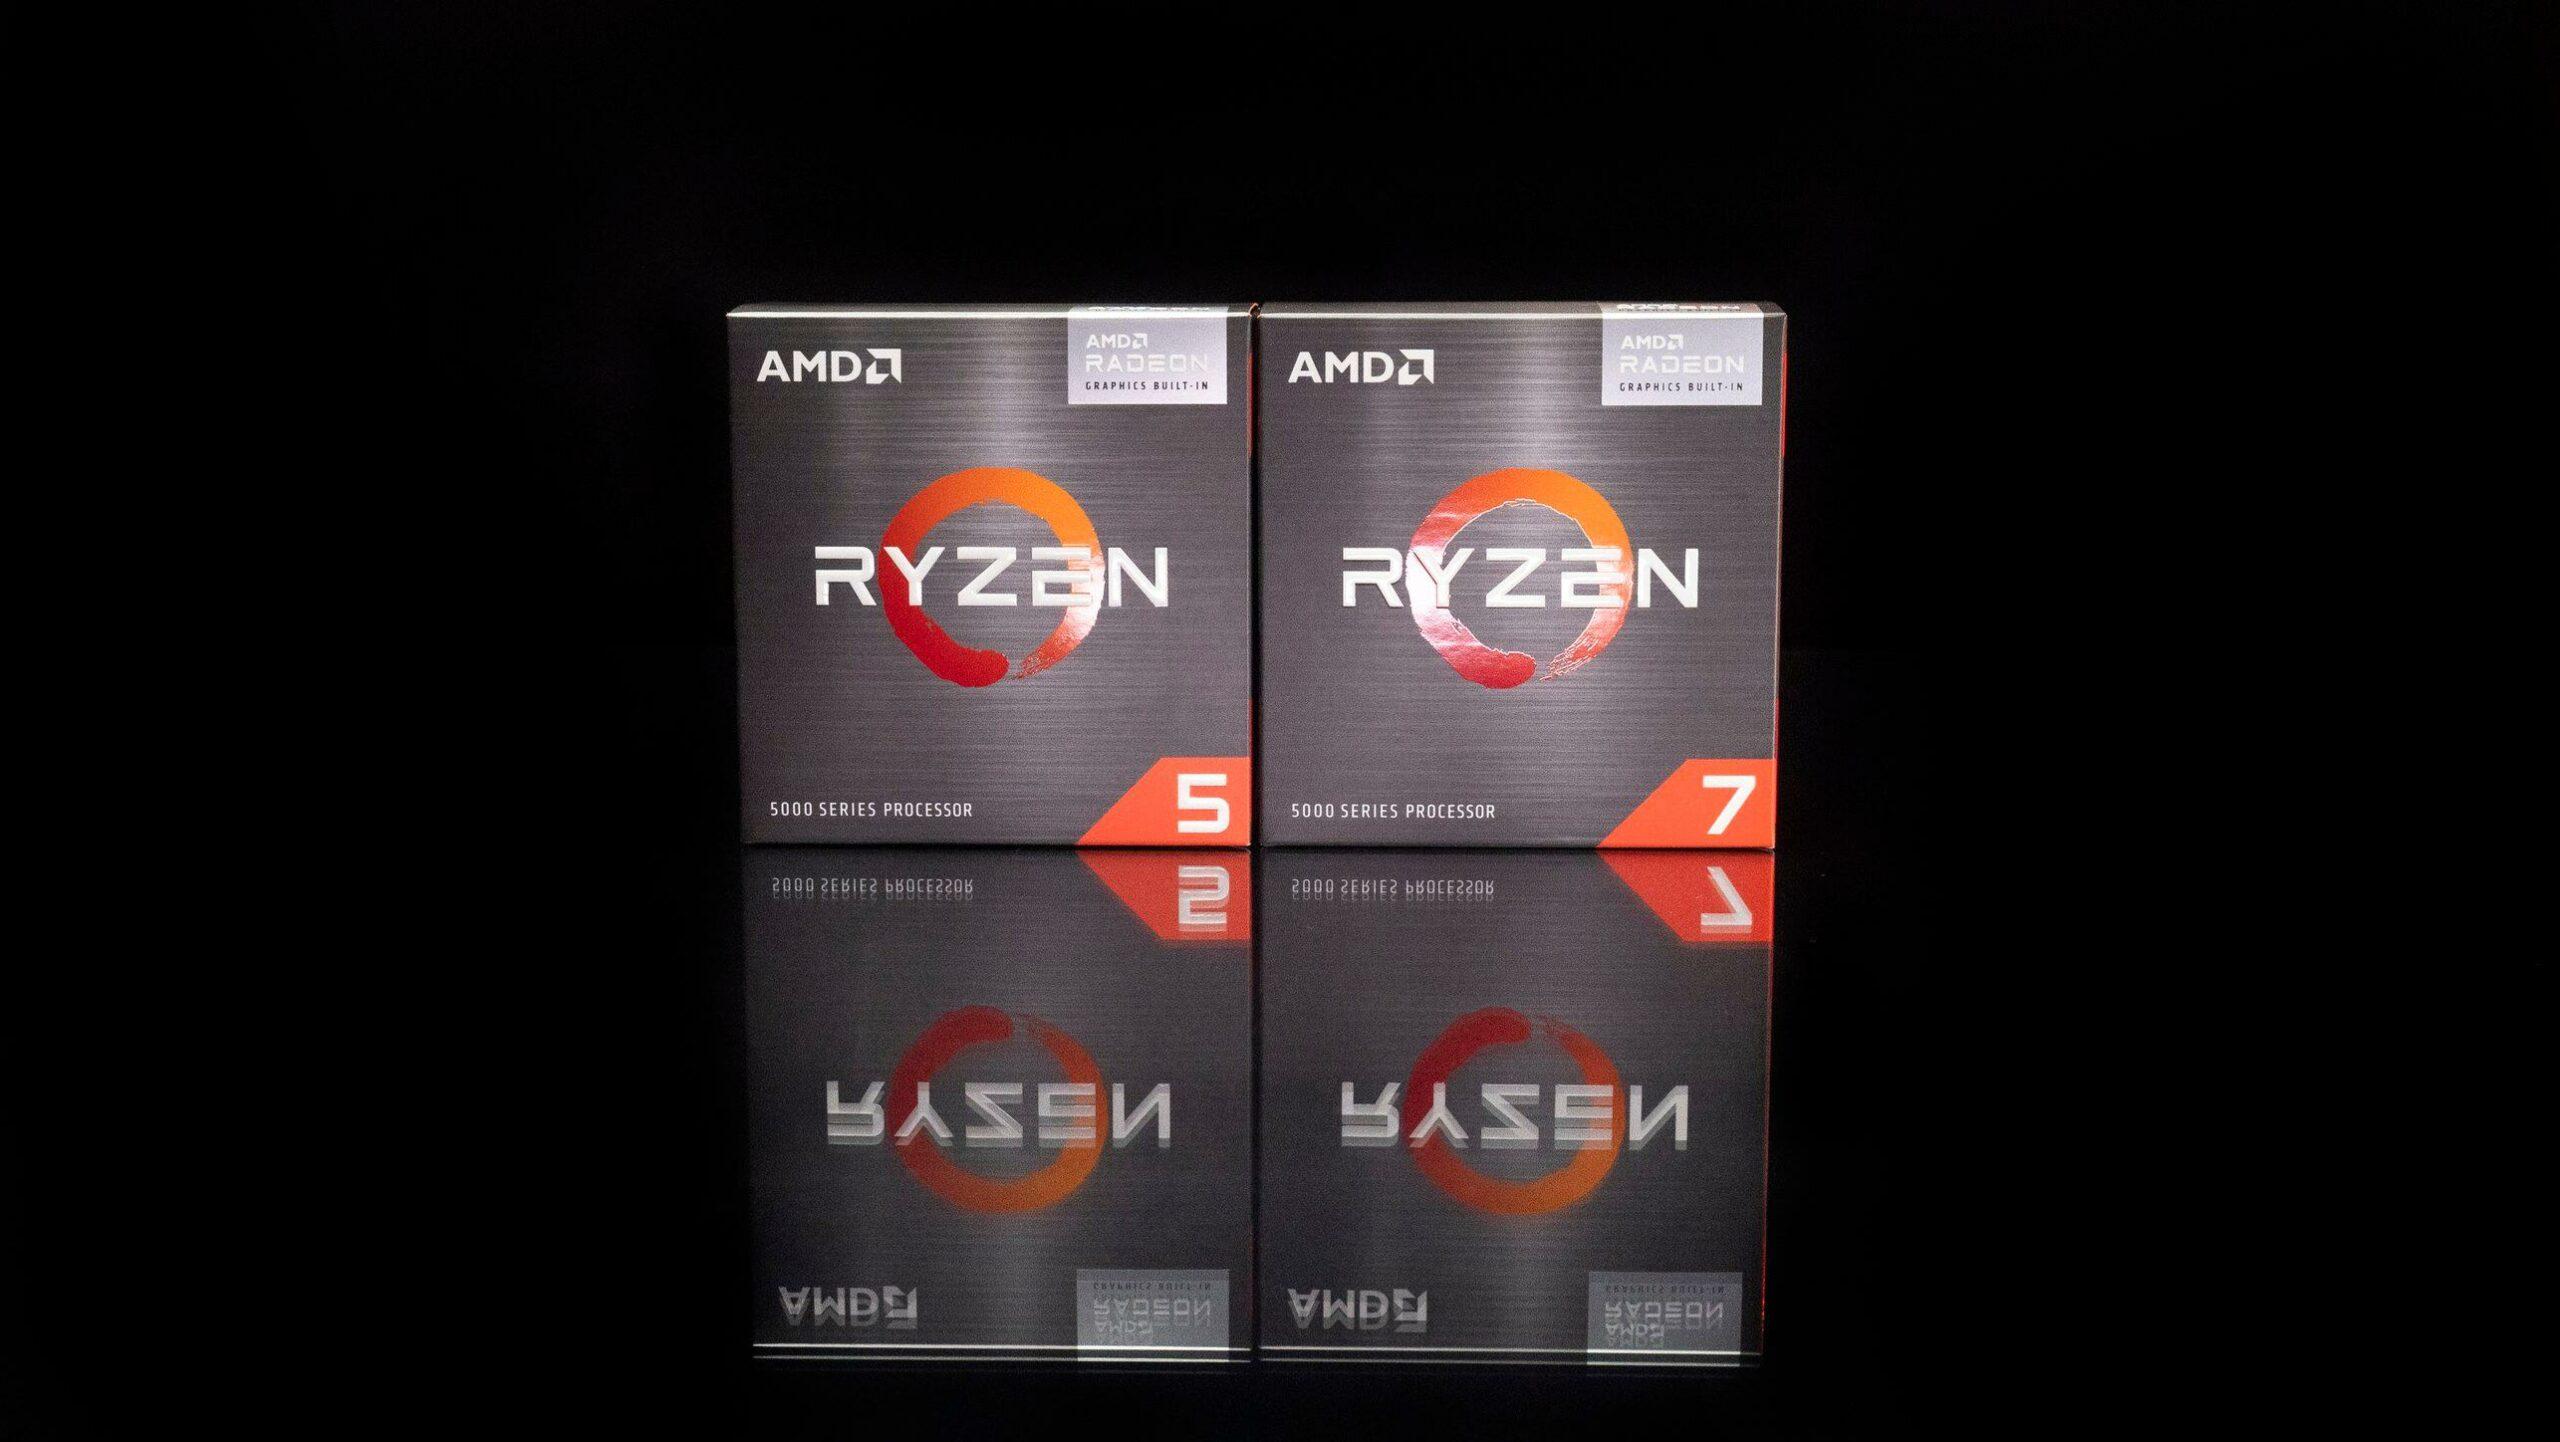 AMD Ryzen 7 5700G & Ryzen 5 5600G Desktop APUs Now Listed By Retailers